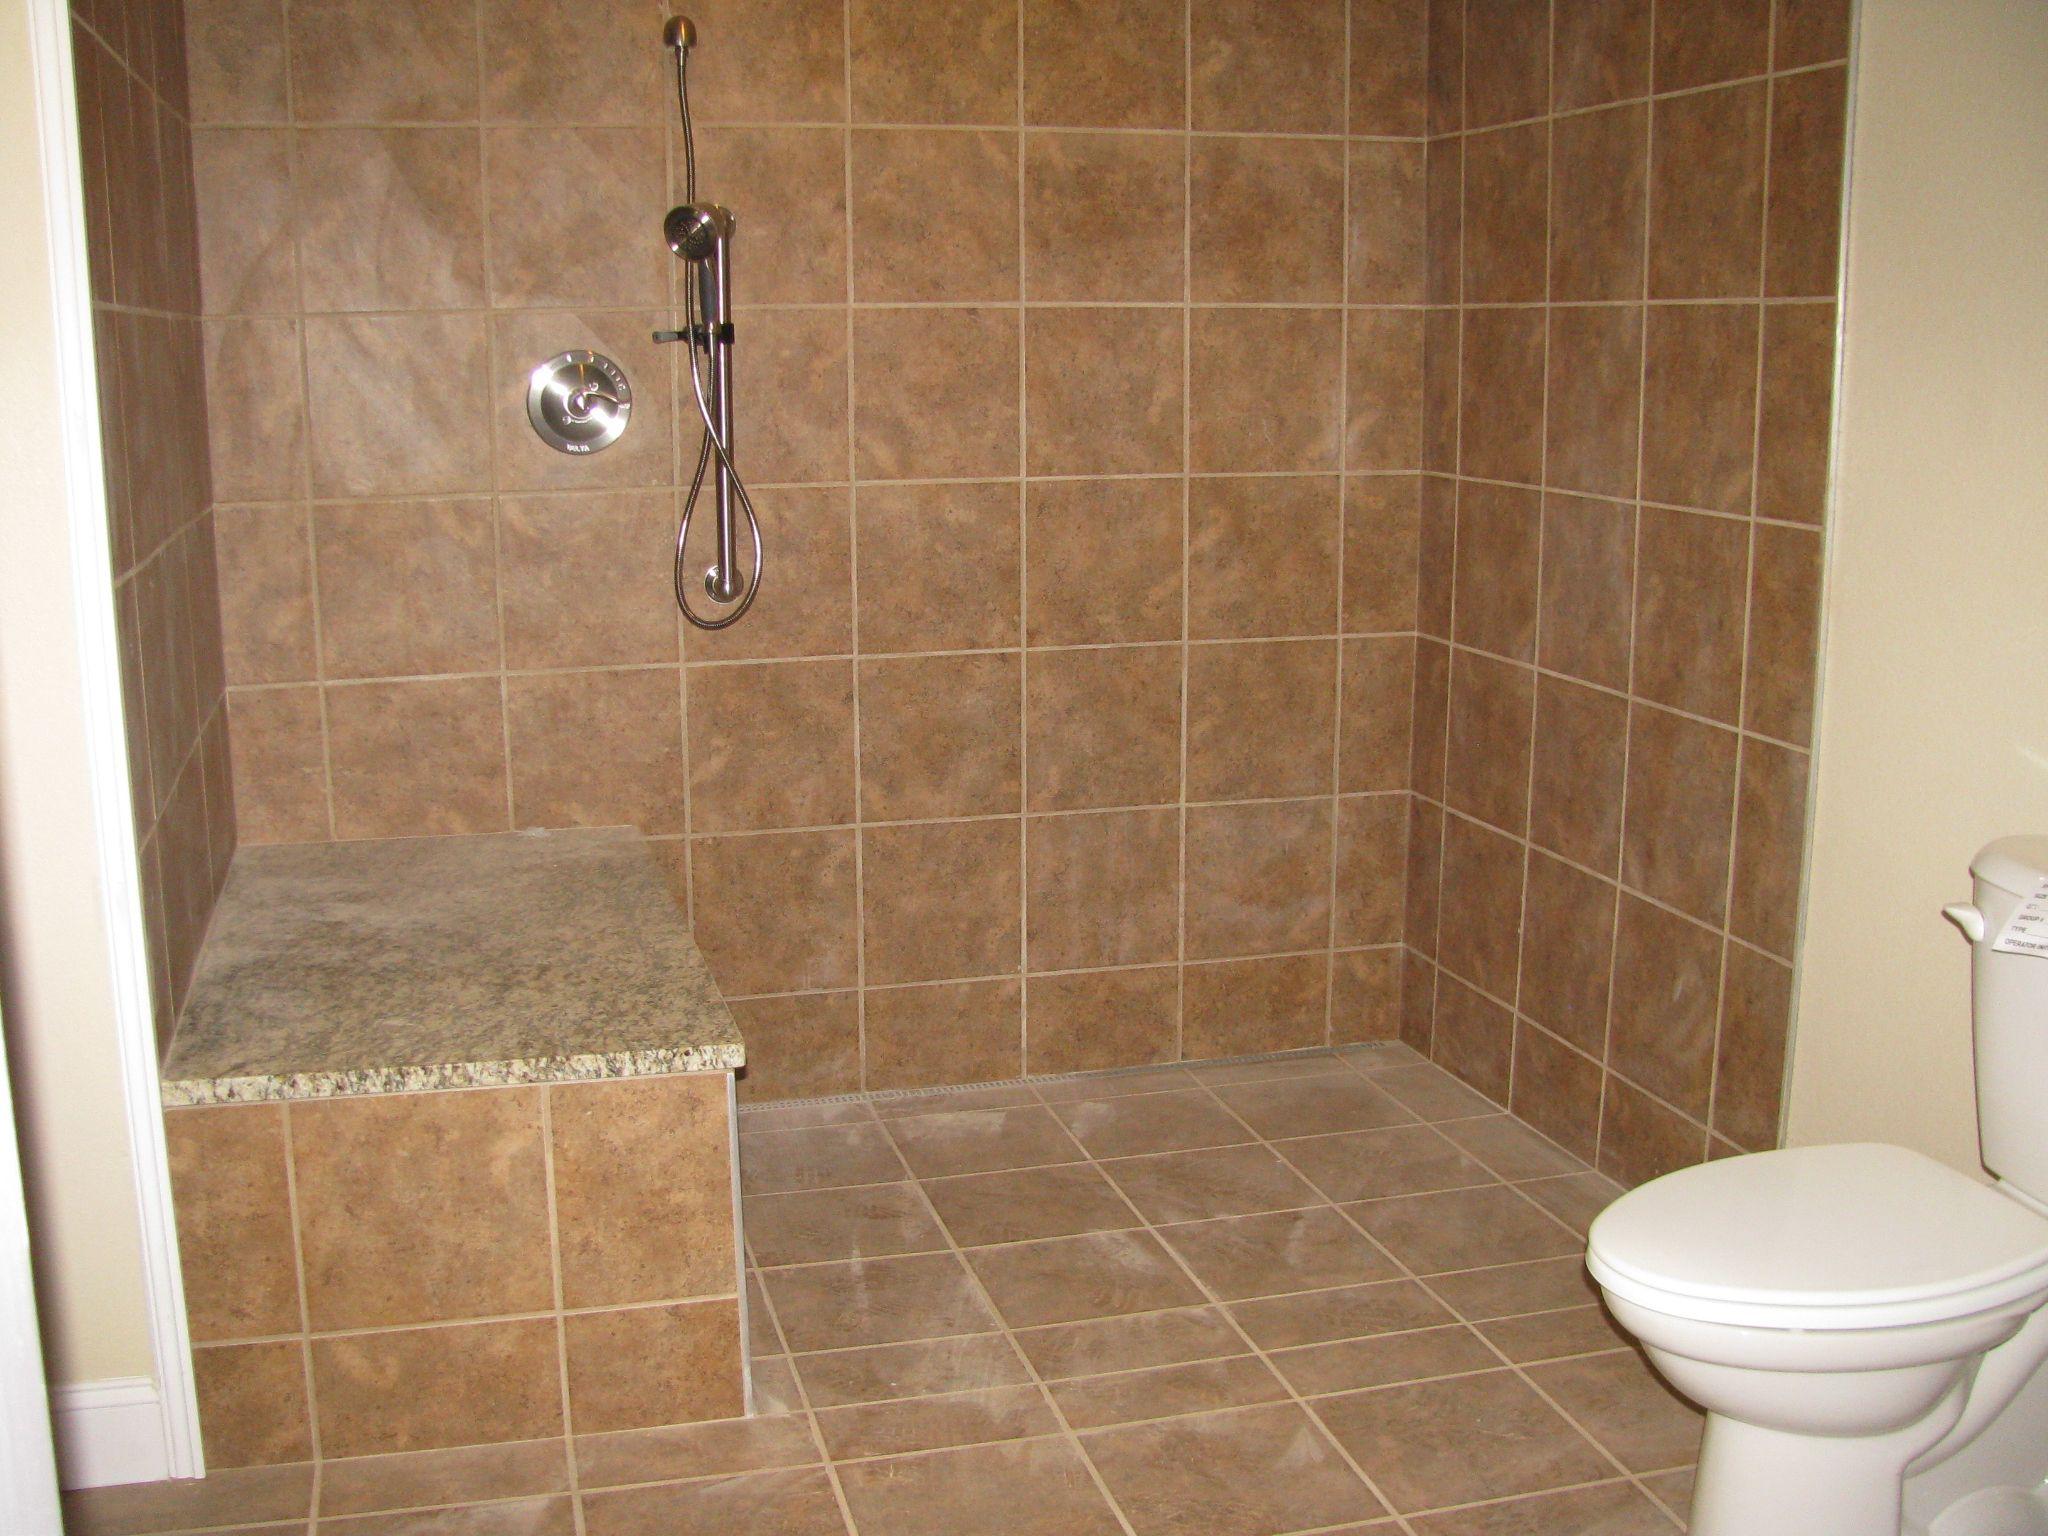 Roll in shower area